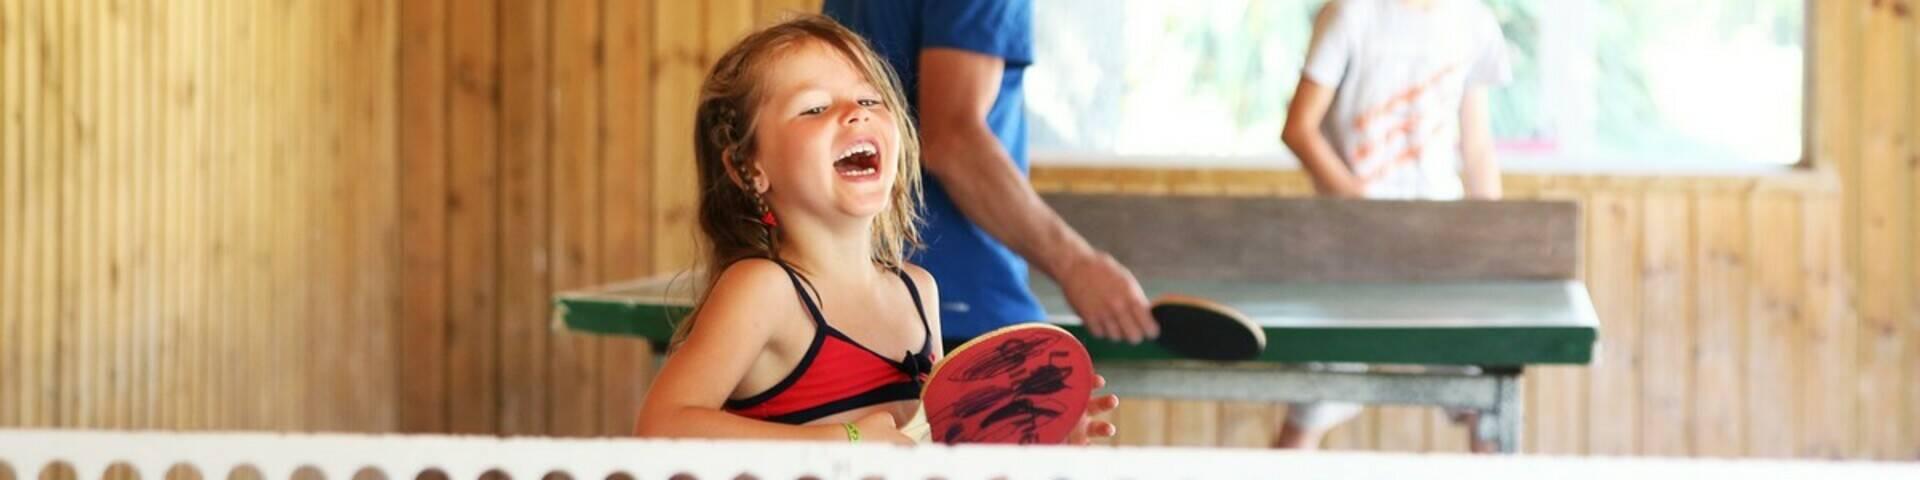 Meisje speelt tafeltennis